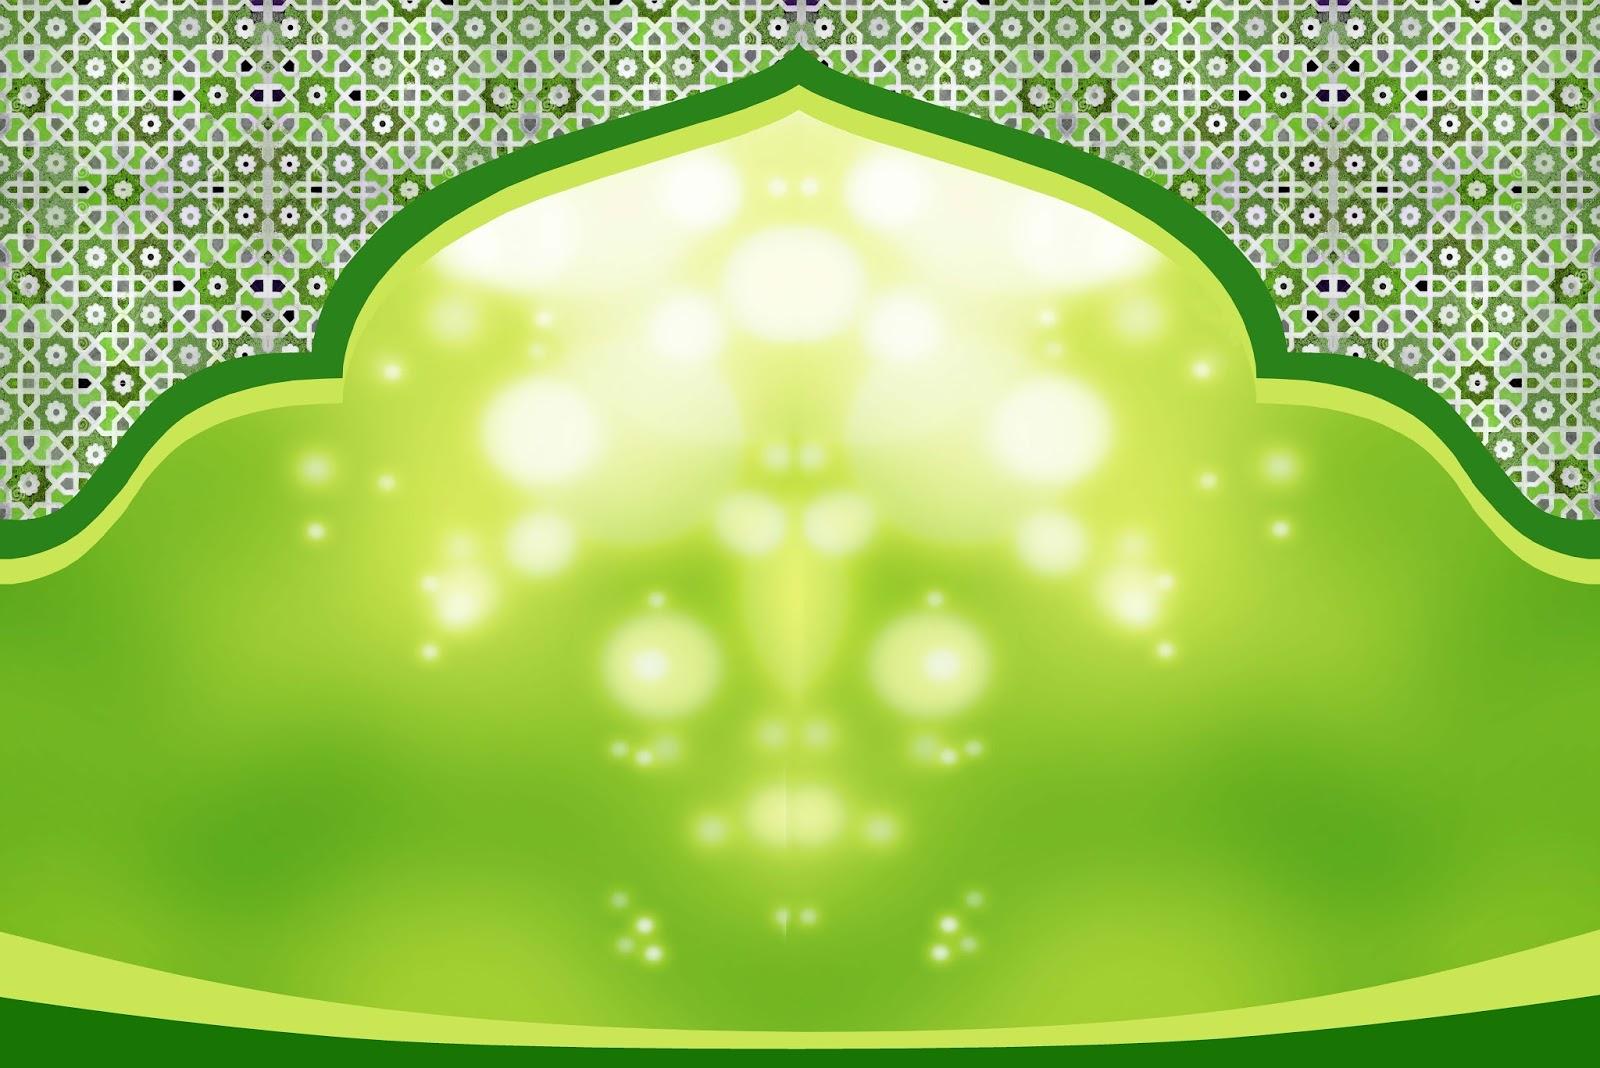 islamic background f islamic background g islamic background h islamic